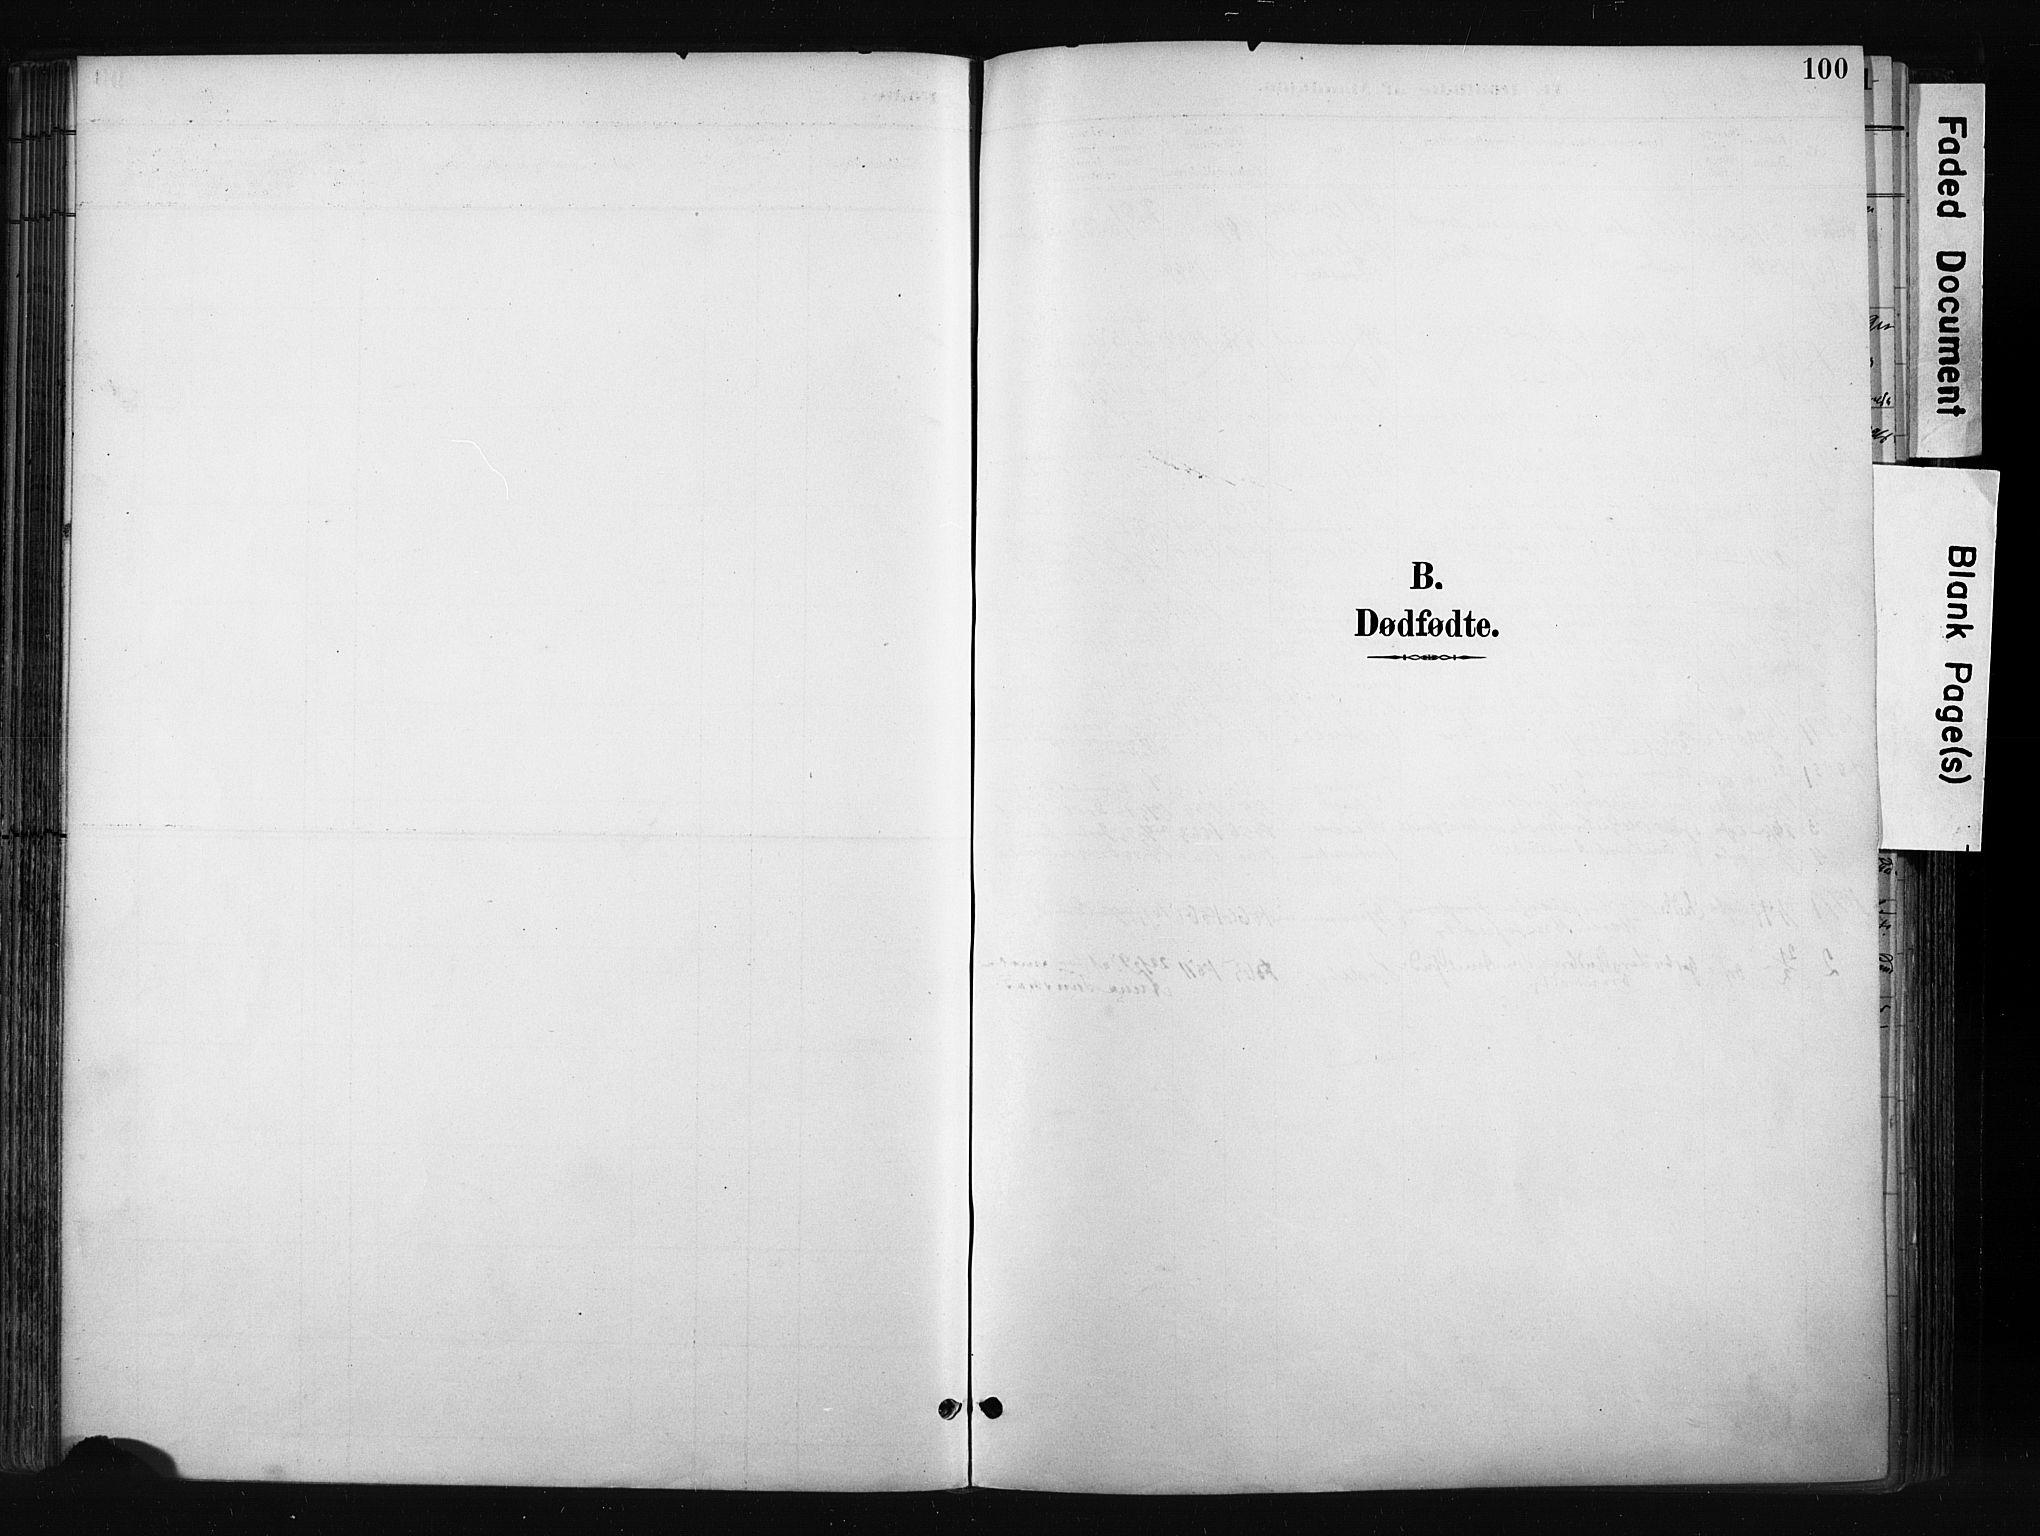 SAH, Gran prestekontor, Parish register (official) no. 17, 1889-1897, p. 100